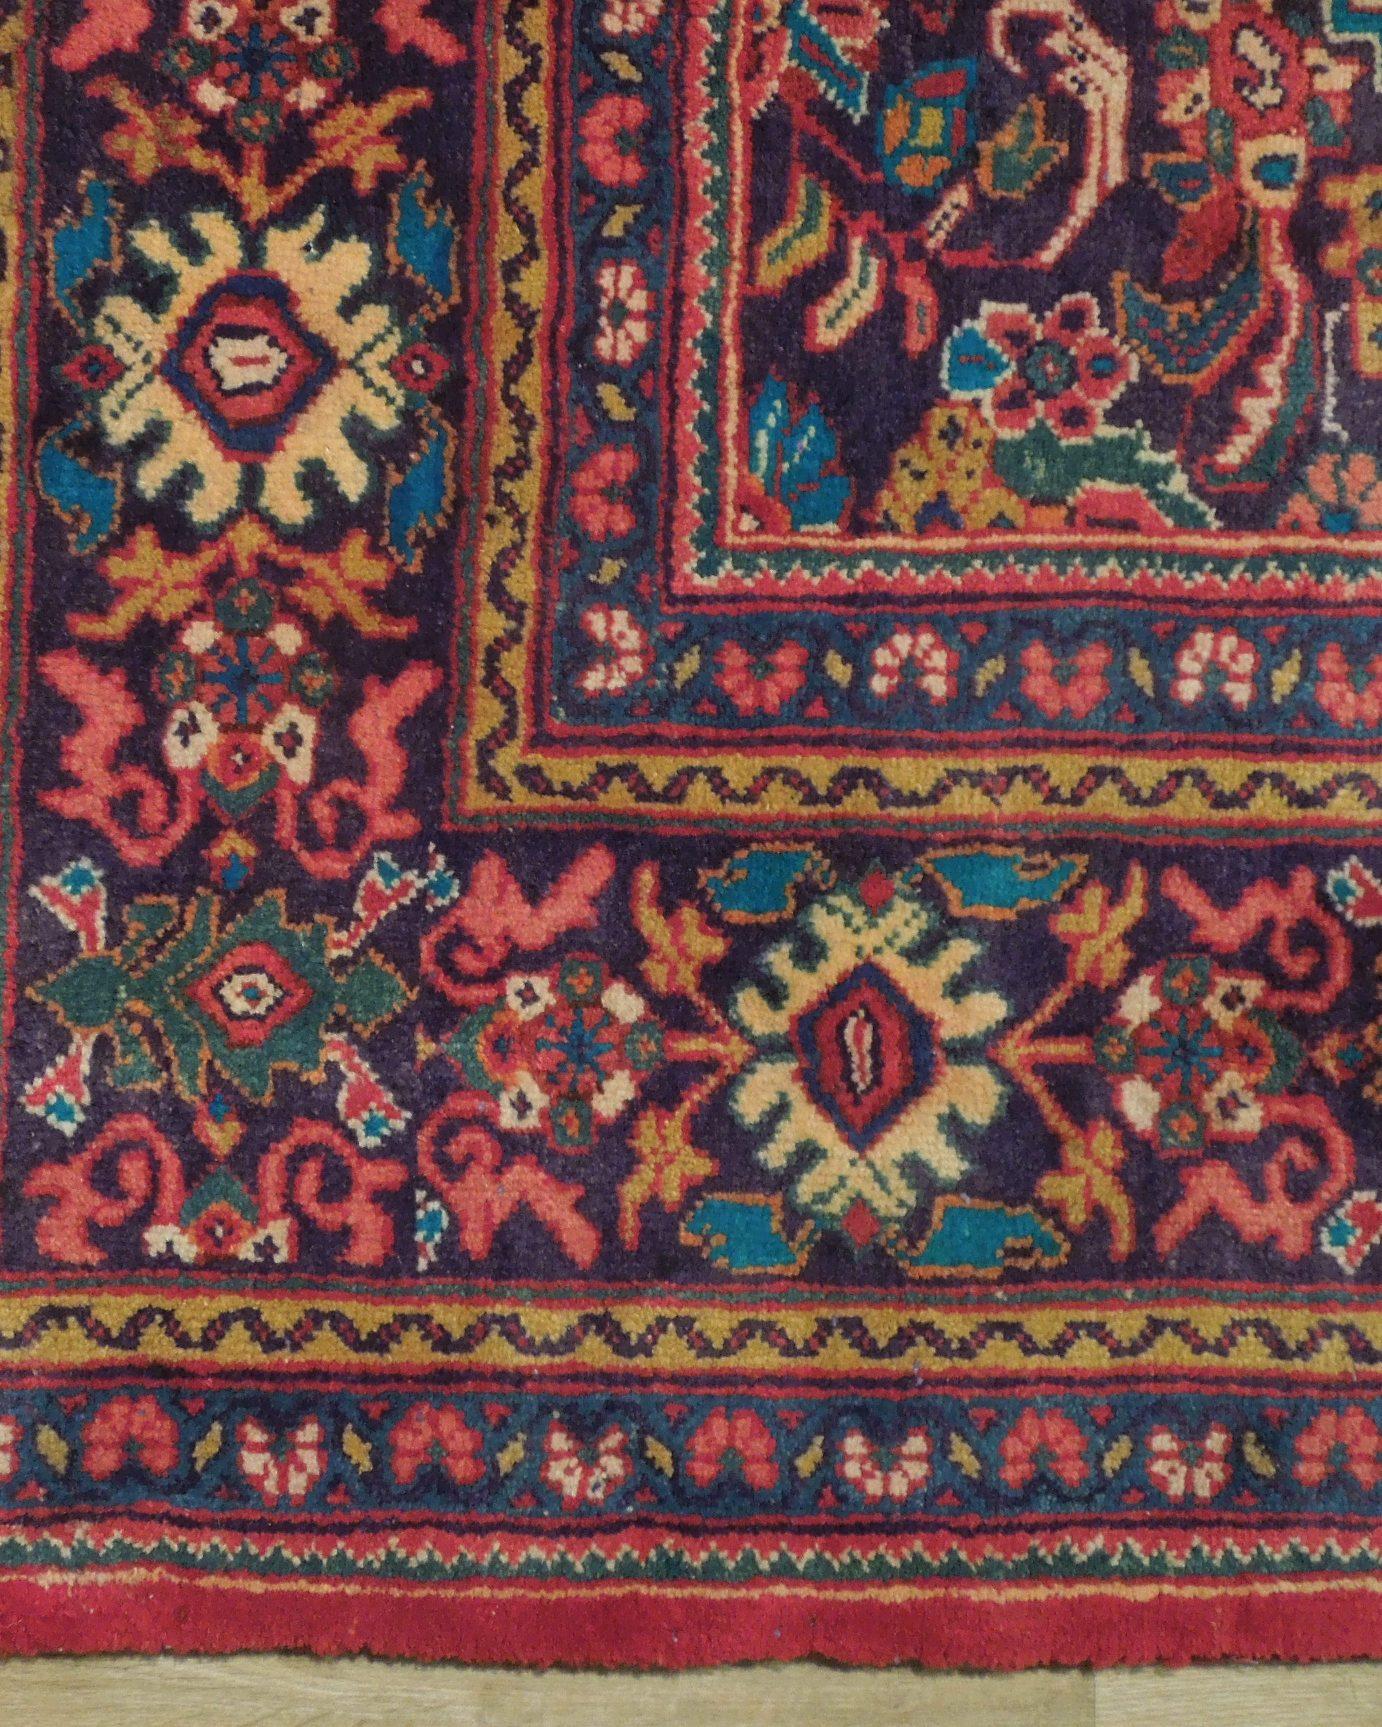 Durable Semi Antique Red Herati Persian Wool Genuine Hand